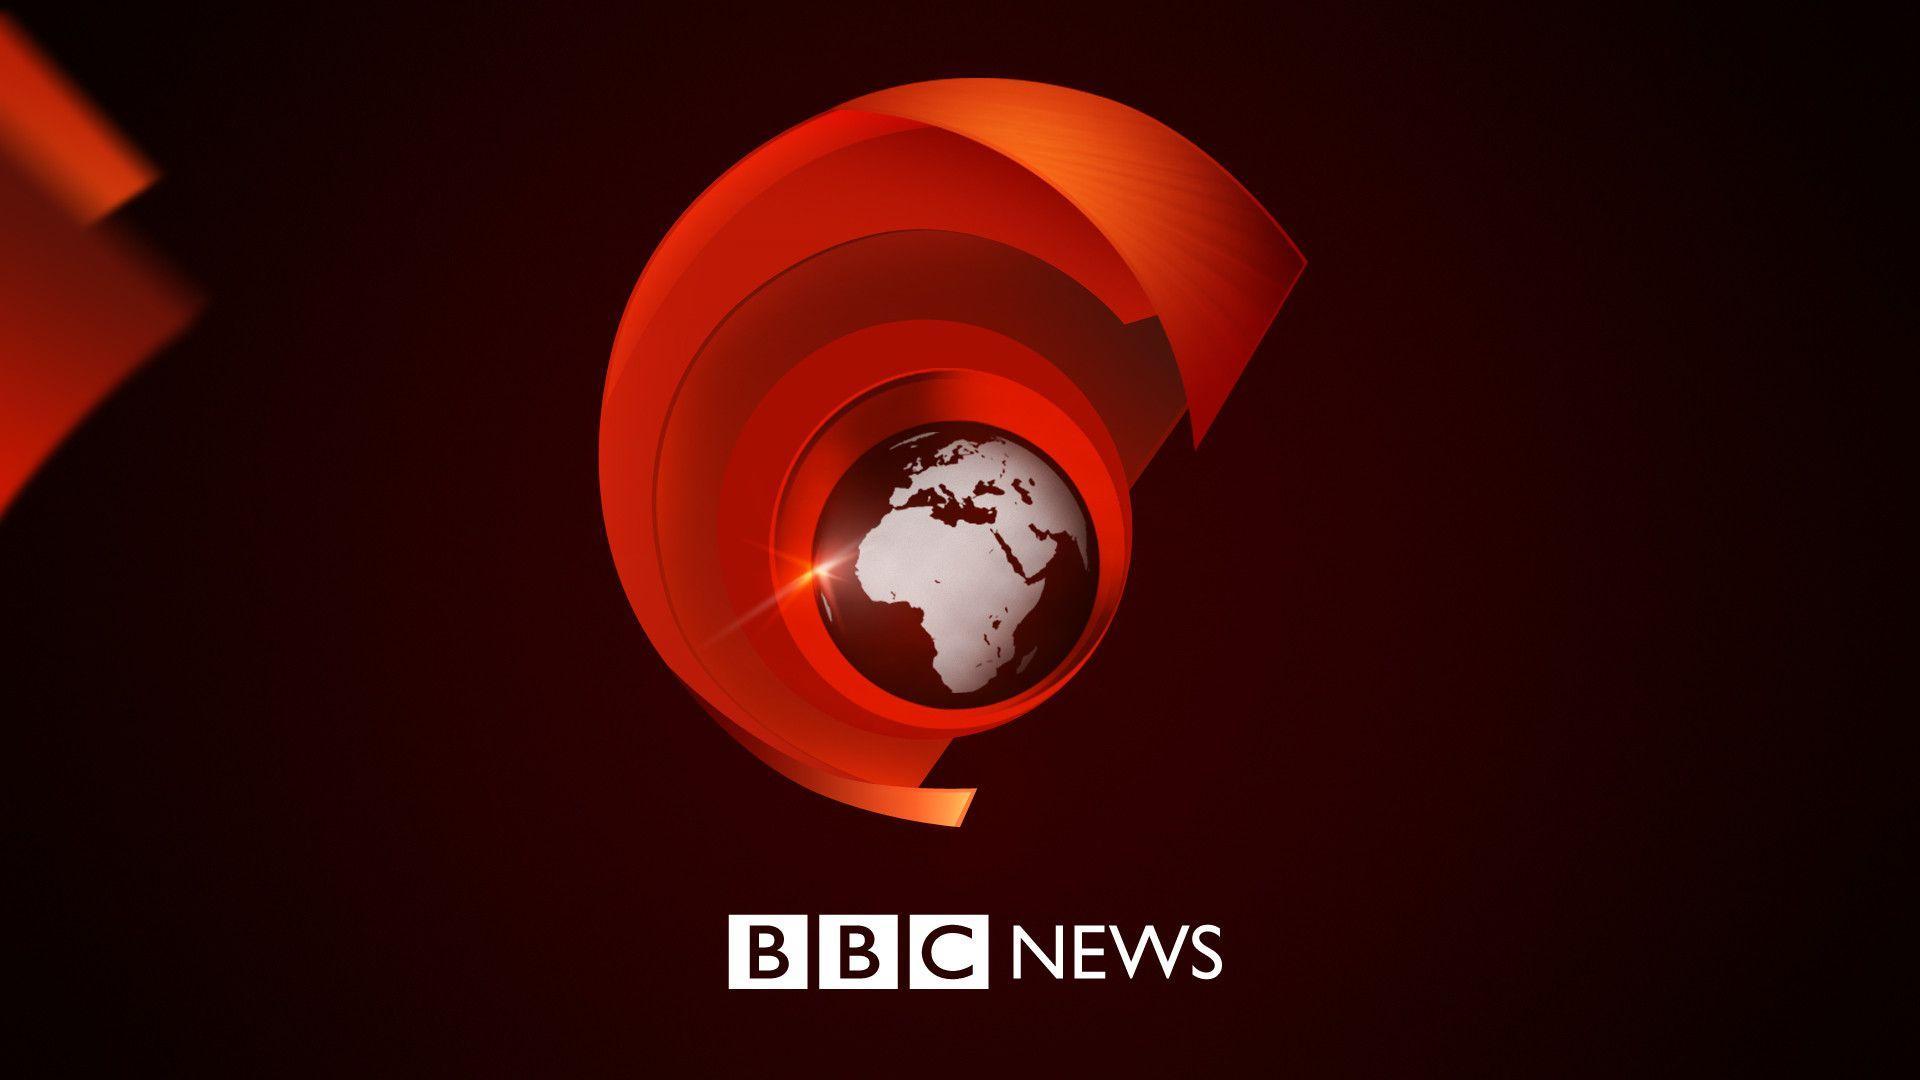 bbc wallpapers wallpaper cave